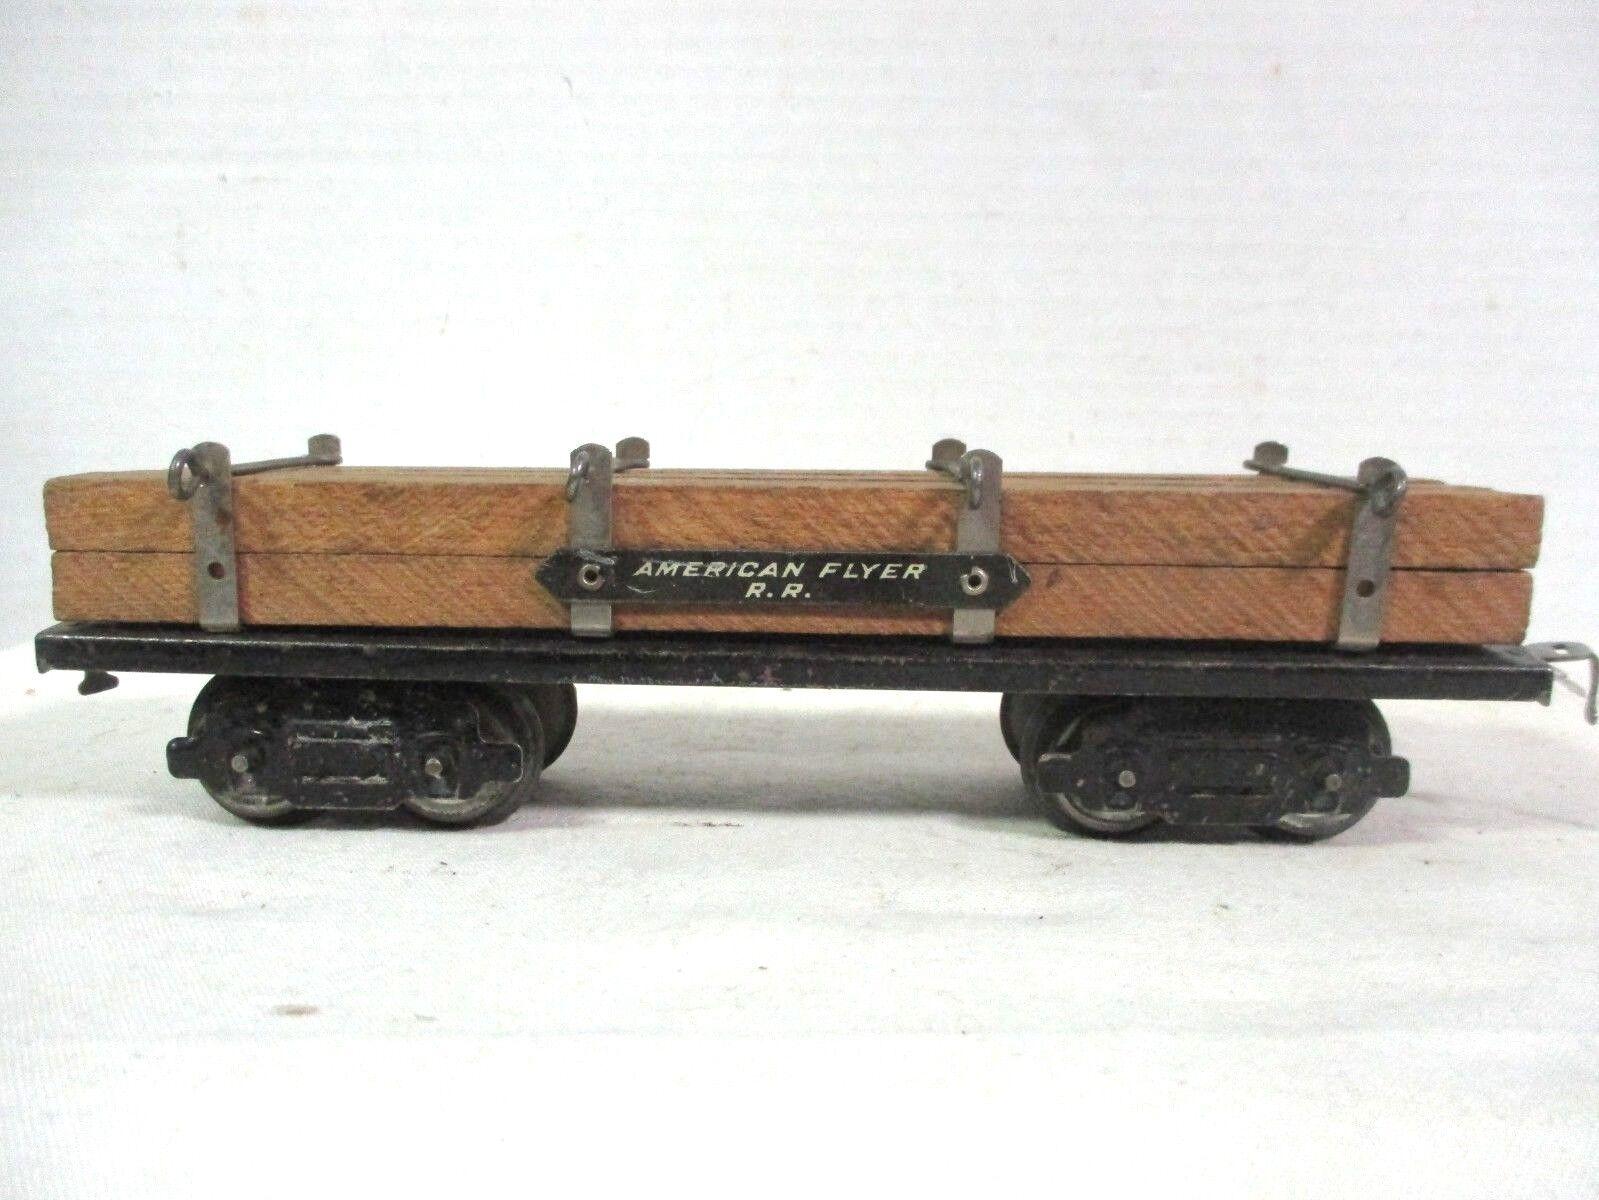 American Flyer Early Flat Car Vintage Railway Train Engine Freight